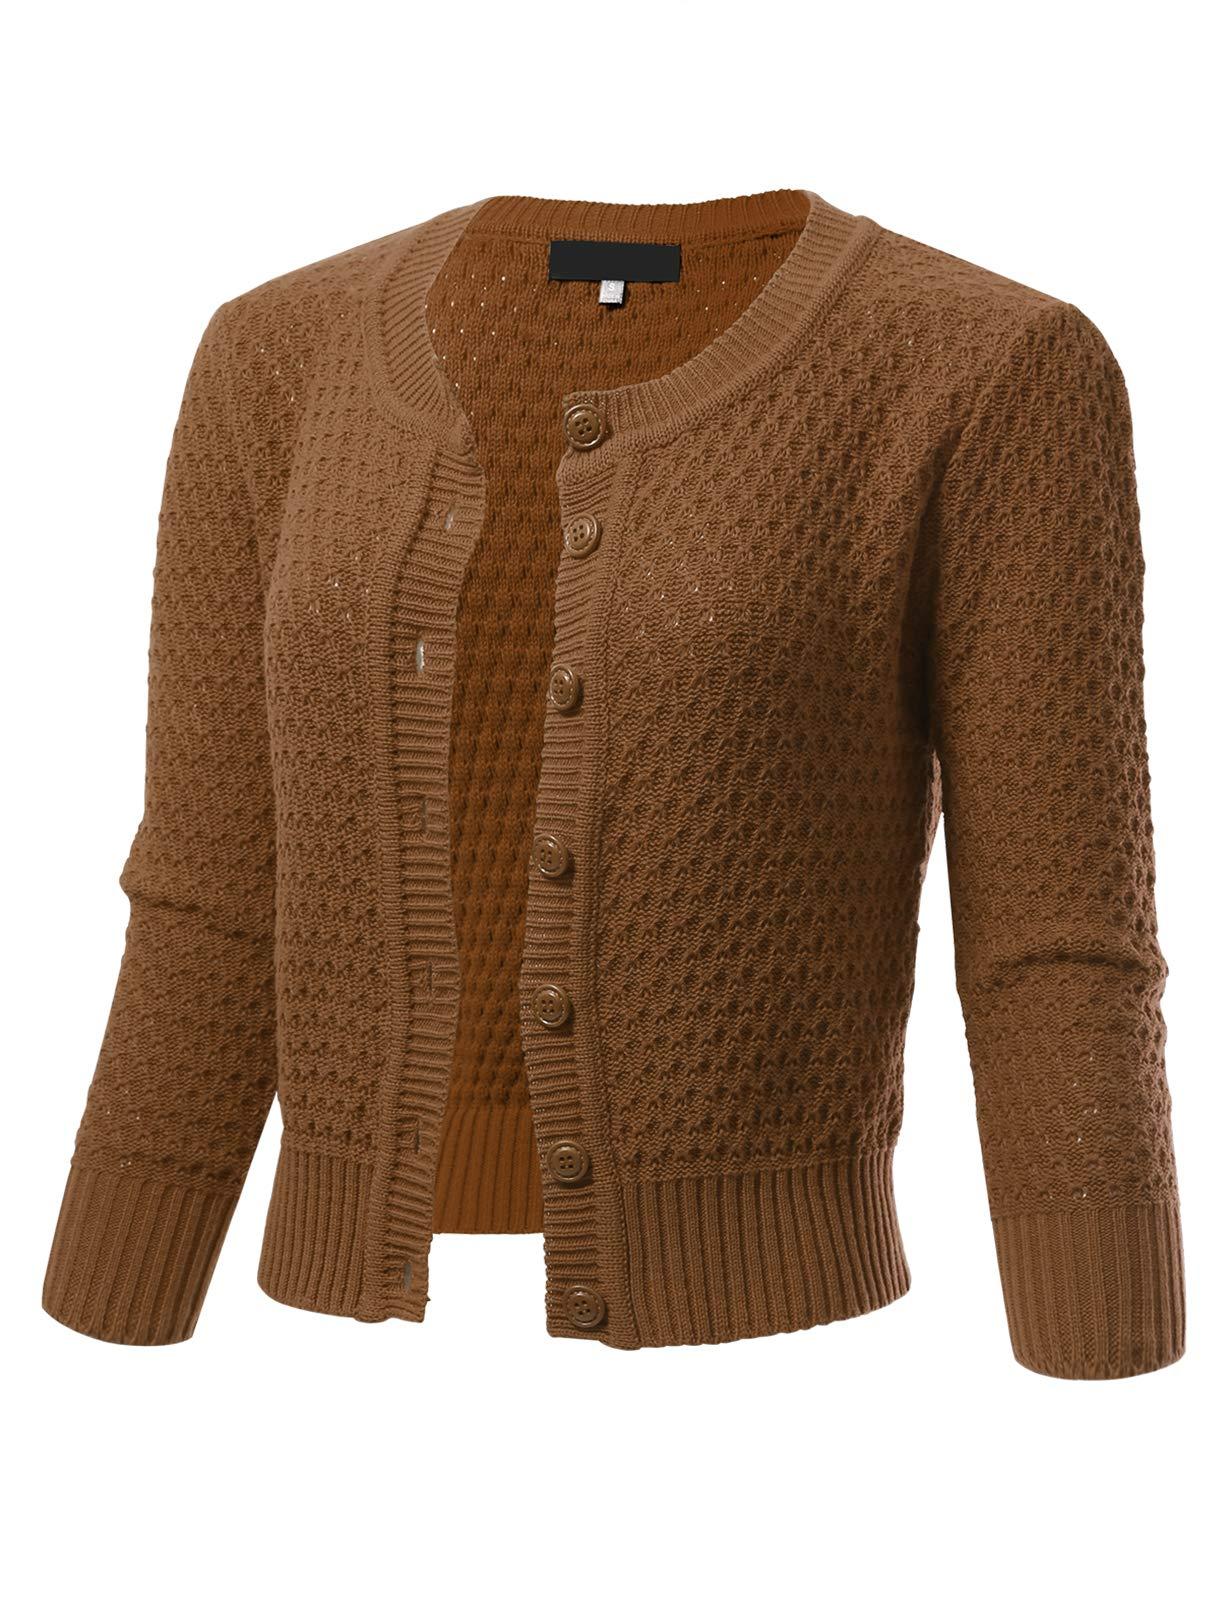 Knit Teen Sweater Patterns - 1000 Free Patterns